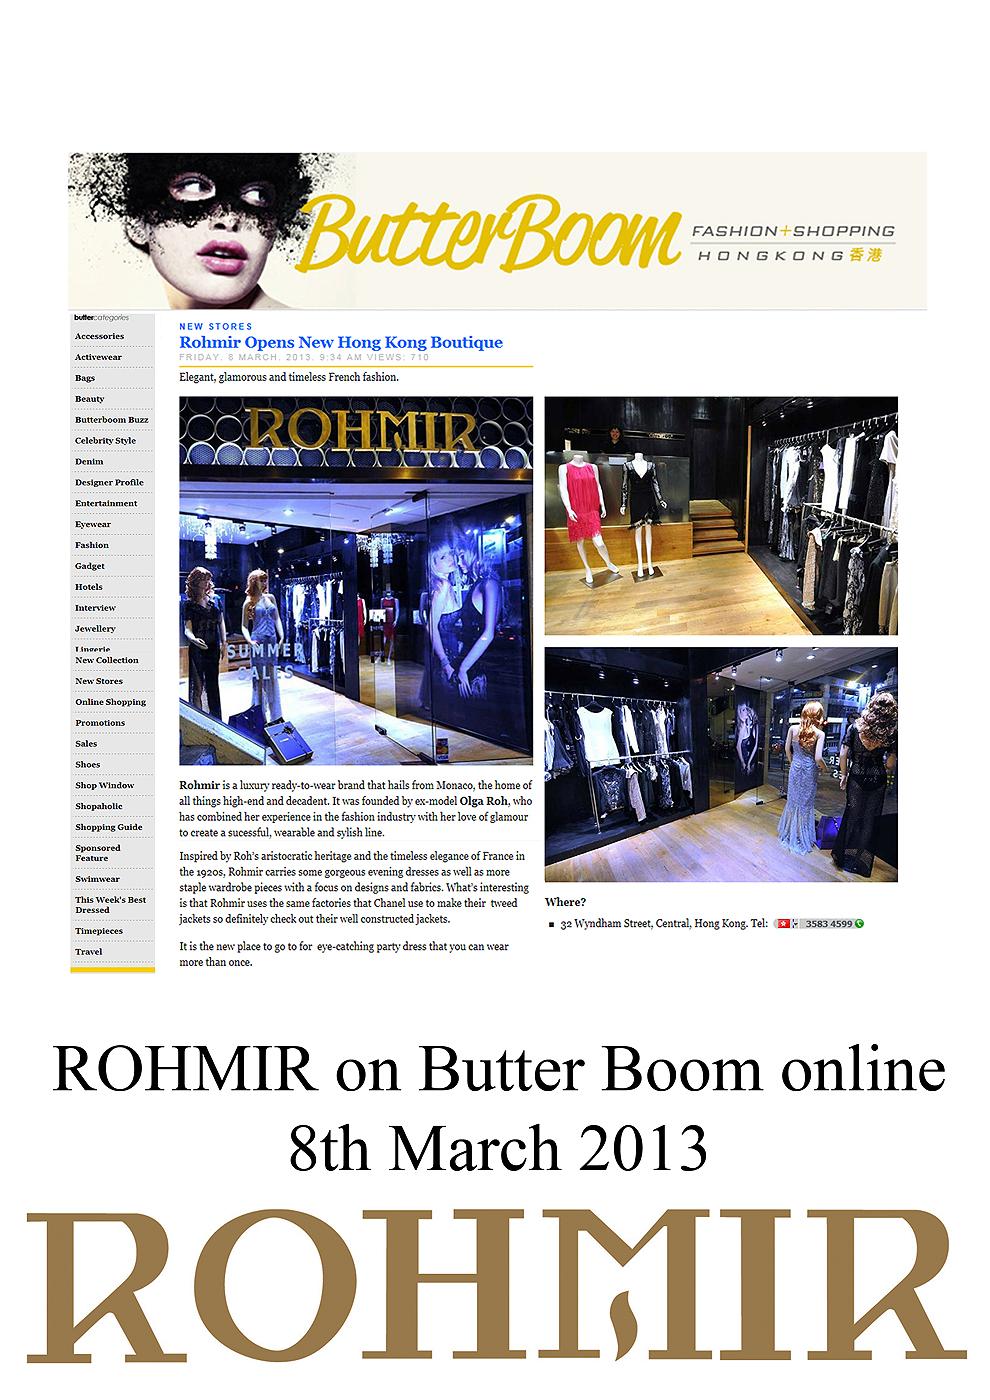 ROHMIR on Butter Boom online 8th Mar 2013